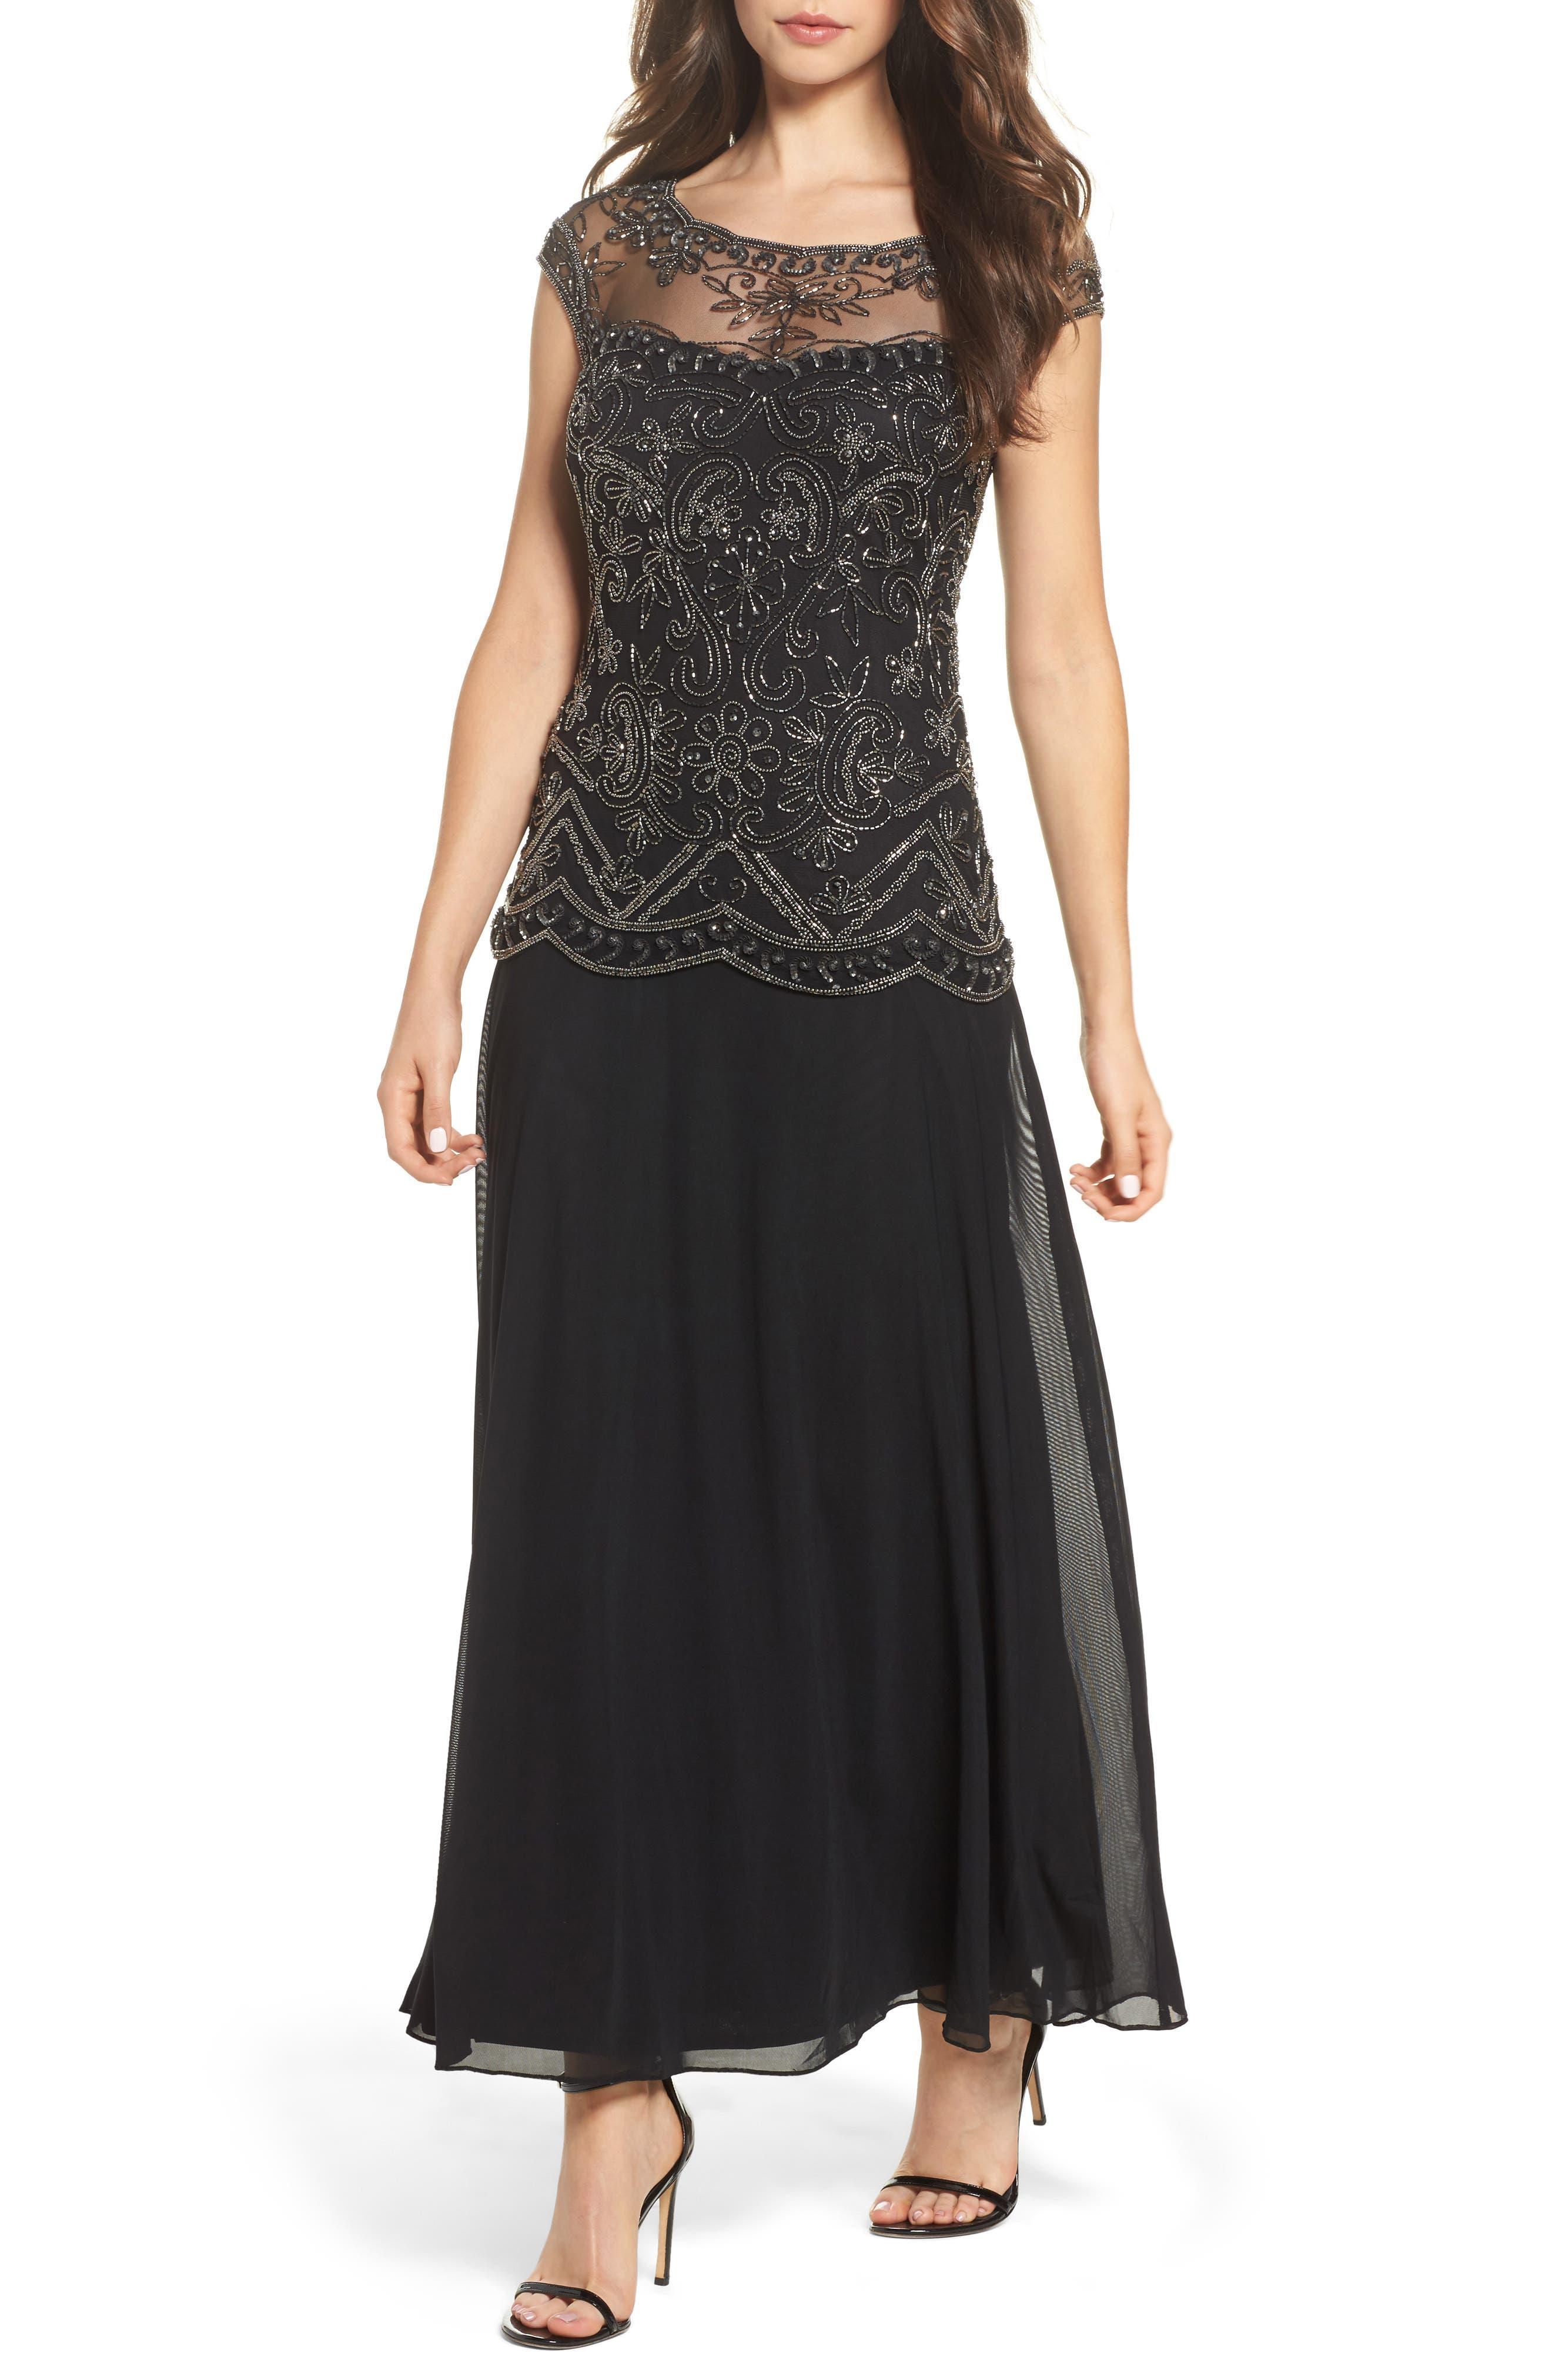 Embellished Cap Sleeve Long Dress,                             Main thumbnail 1, color,                             001